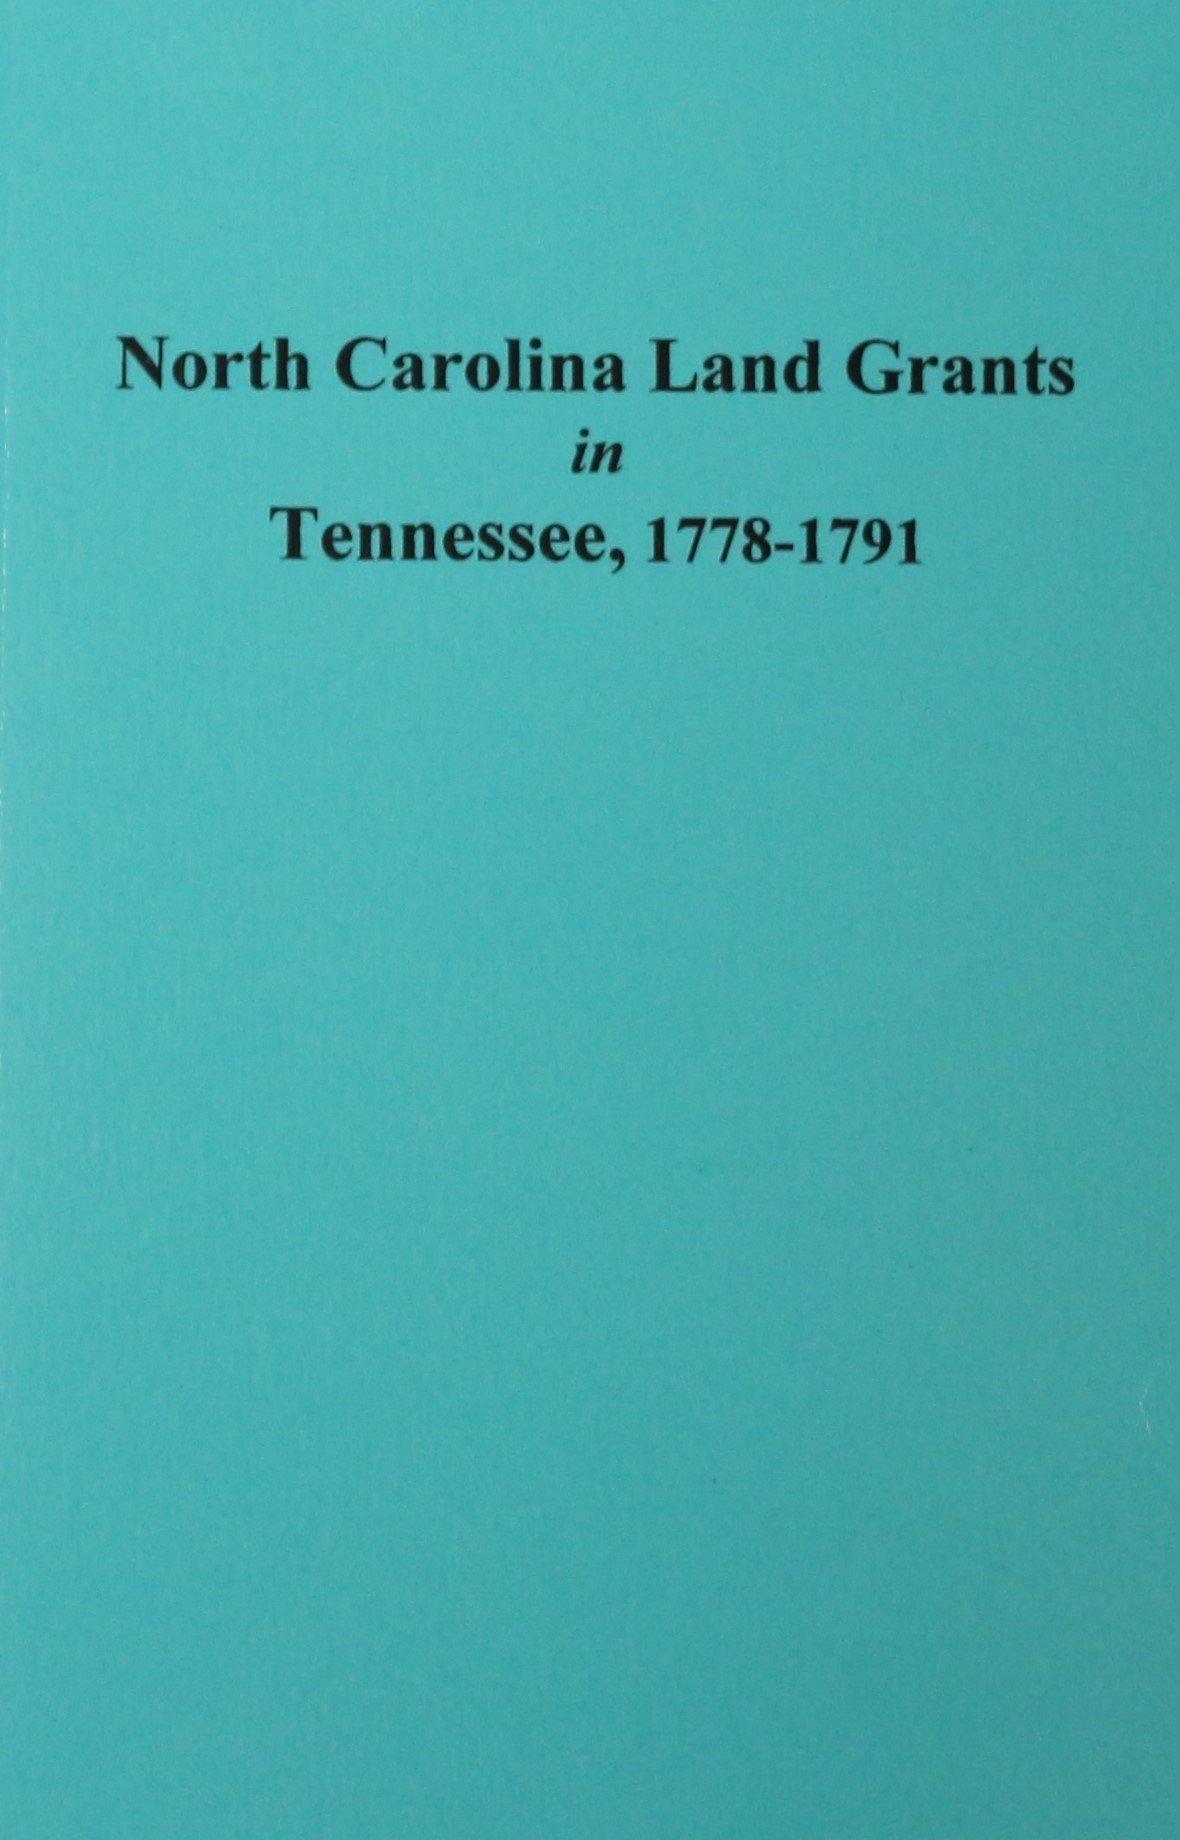 North Carolina Land Grants in Tennessee, 1778-1791: Goldene Fillers  Burgner: 9780893082055: Amazon.com: Books